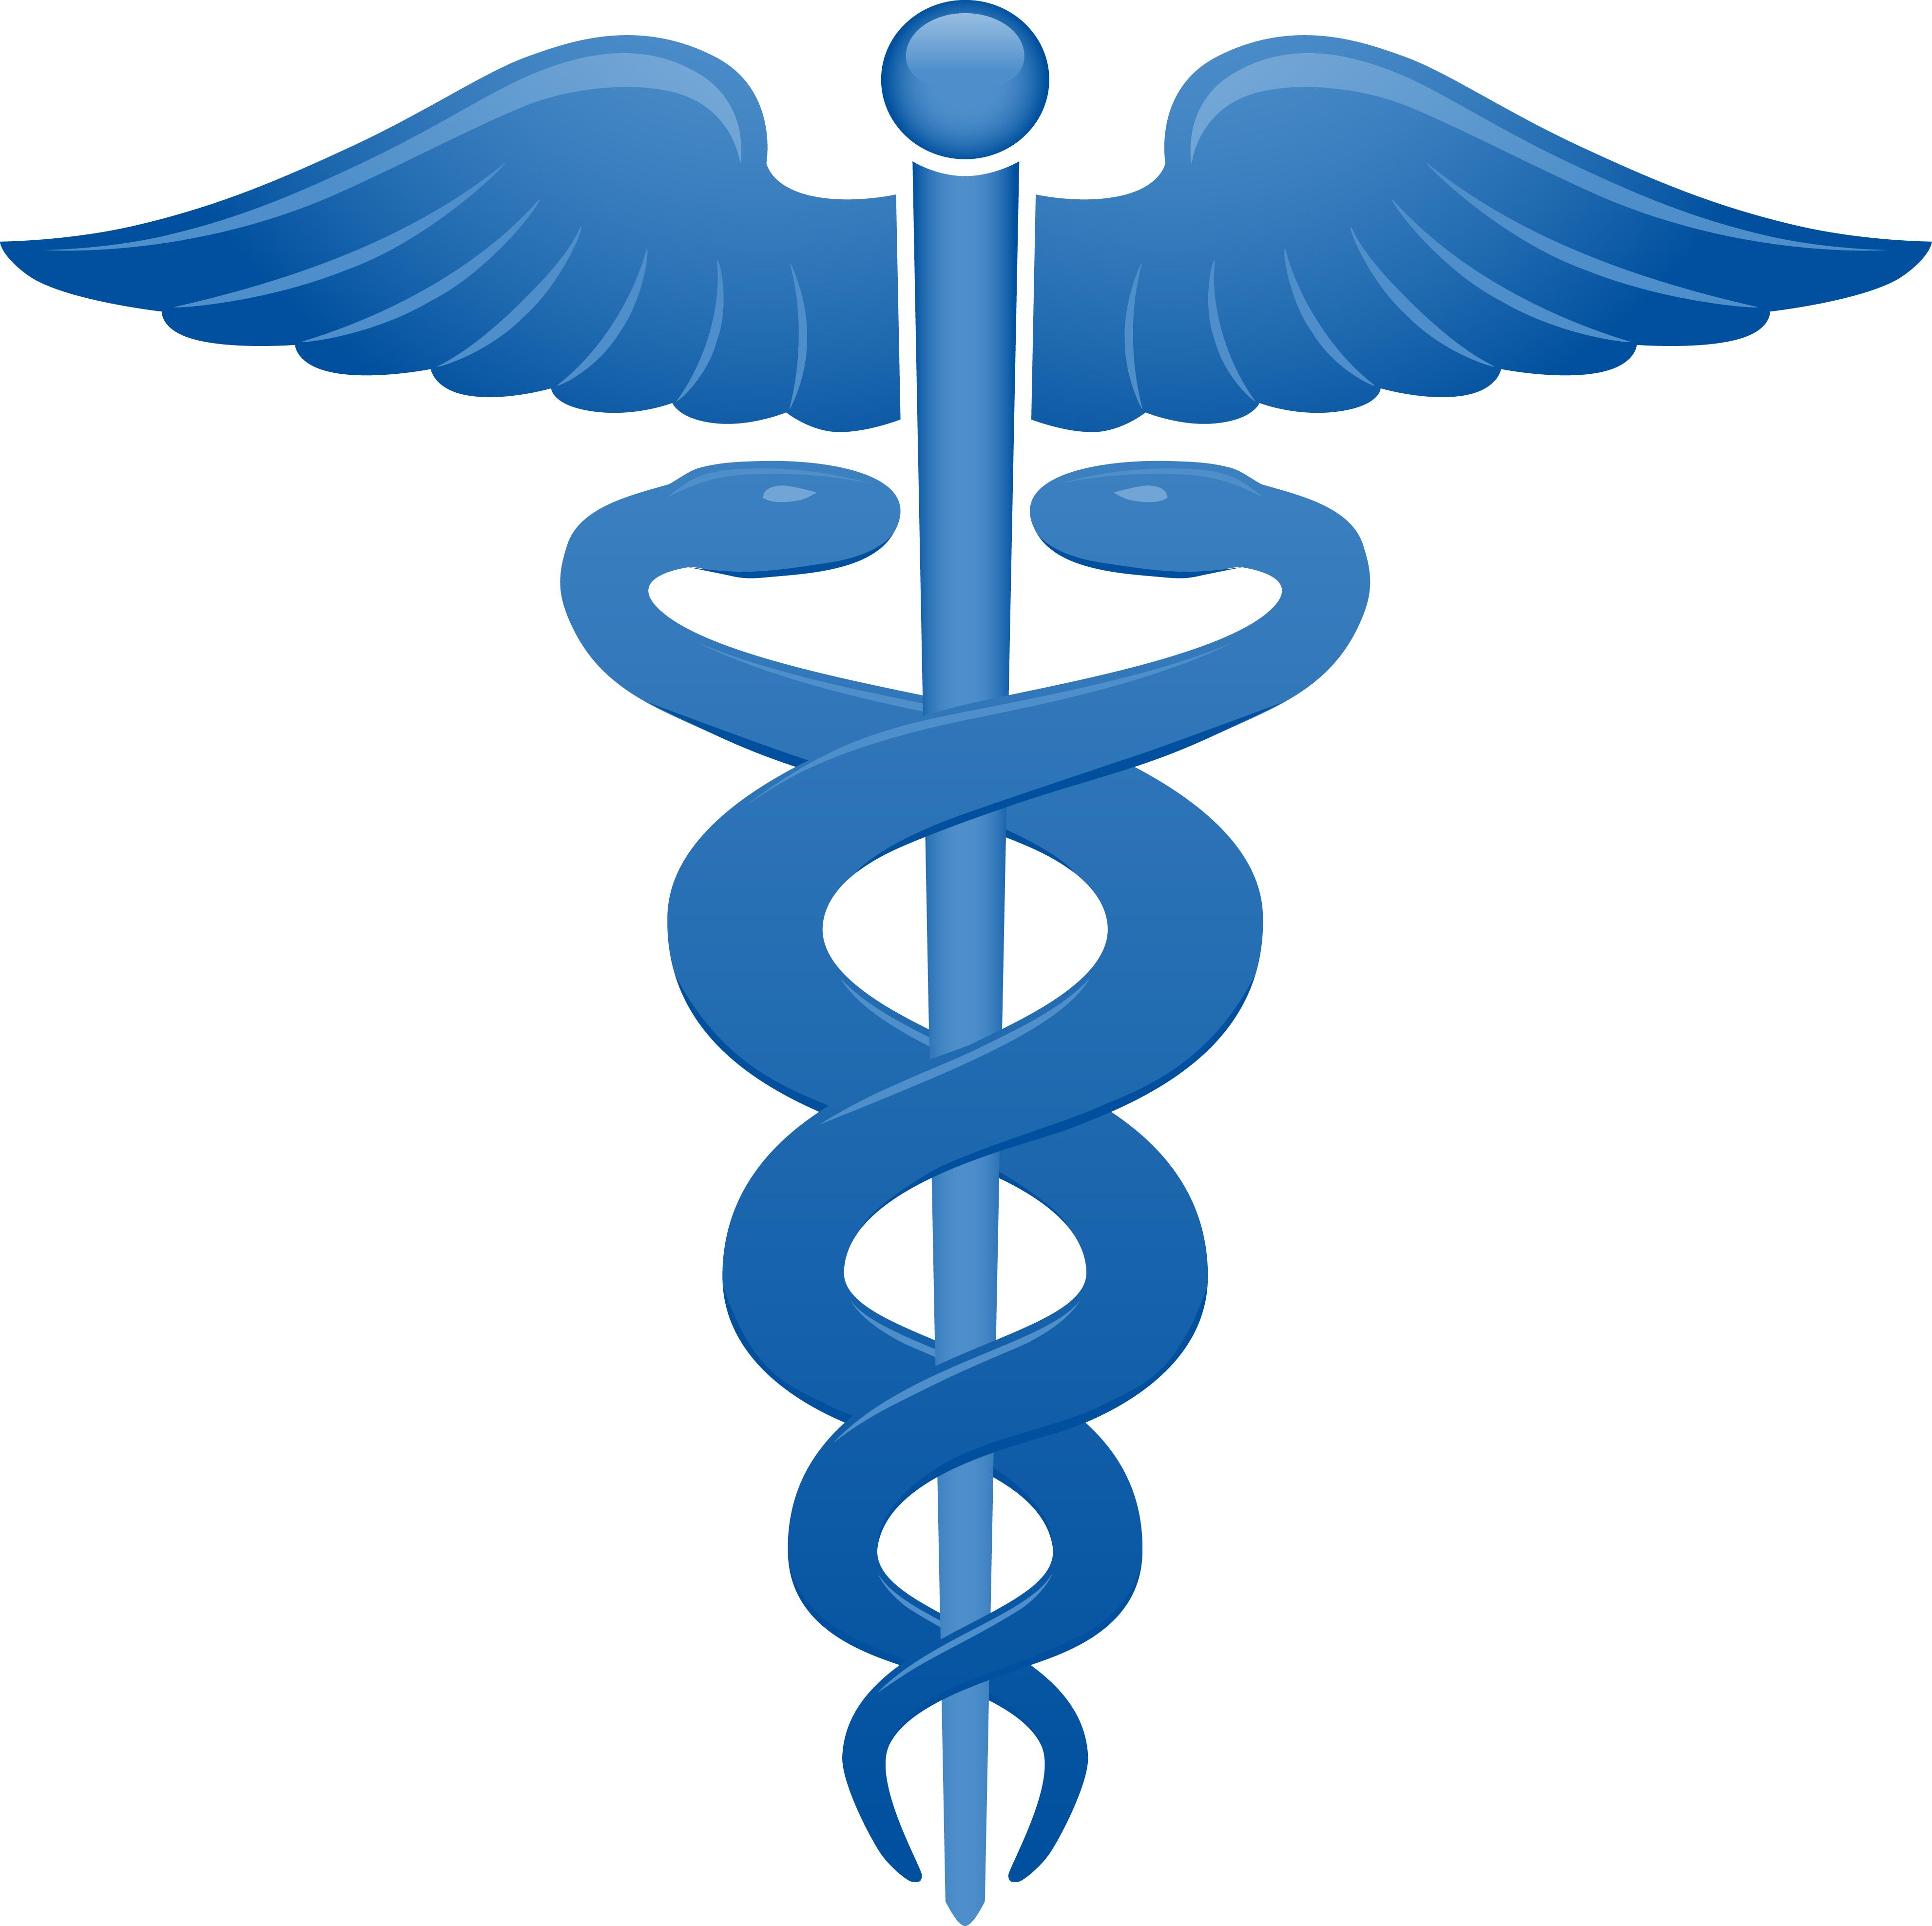 Health logo clipart clipart stock Free Medical Logo, Download Free Clip Art, Free Clip Art on ... clipart stock